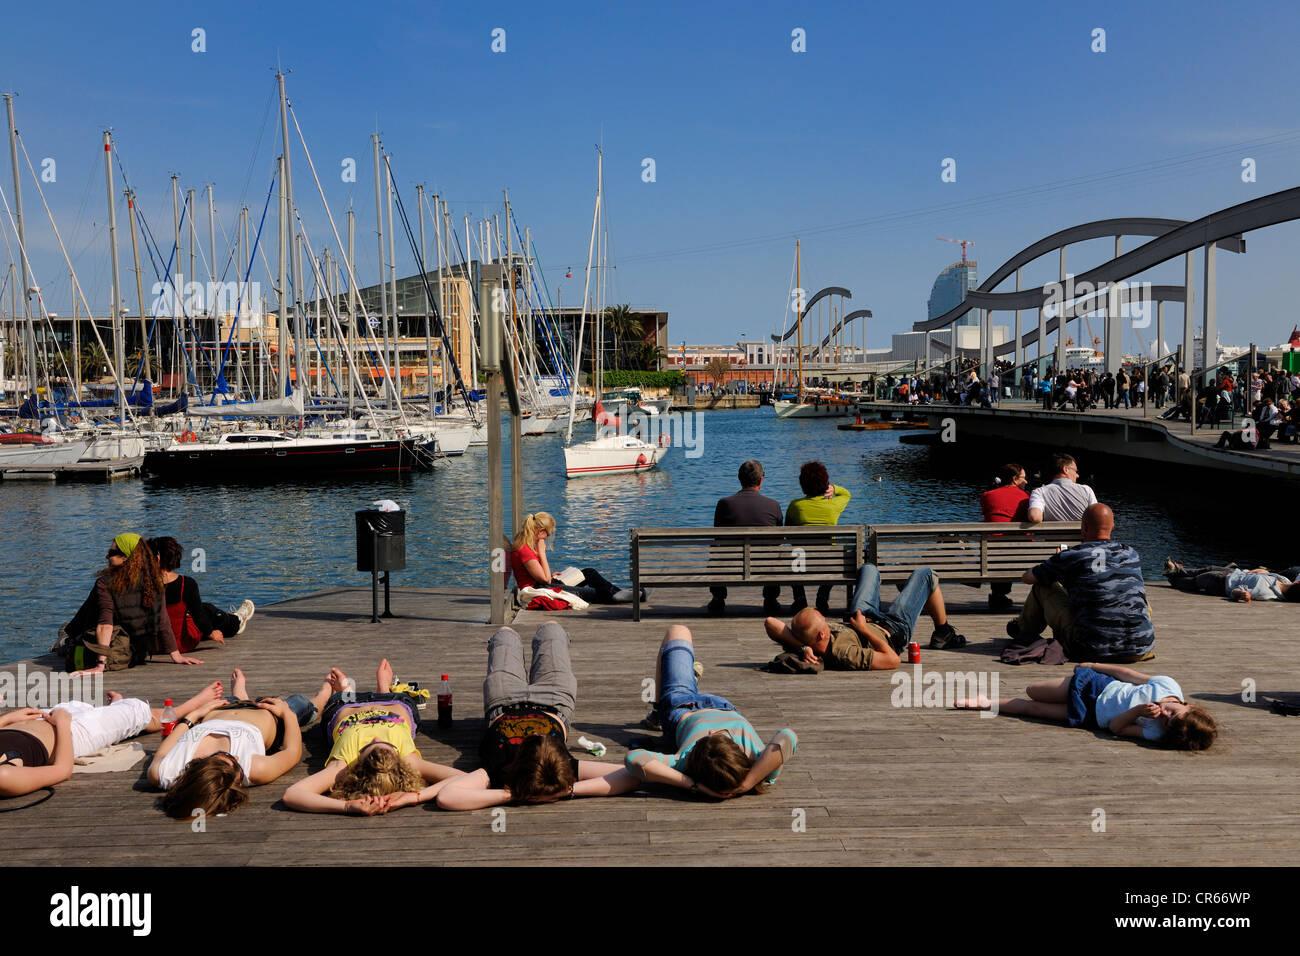 Spain, Catalonia, Barcelona, Port Vell (Vieux Port), facing the Maremagnum - Stock Image